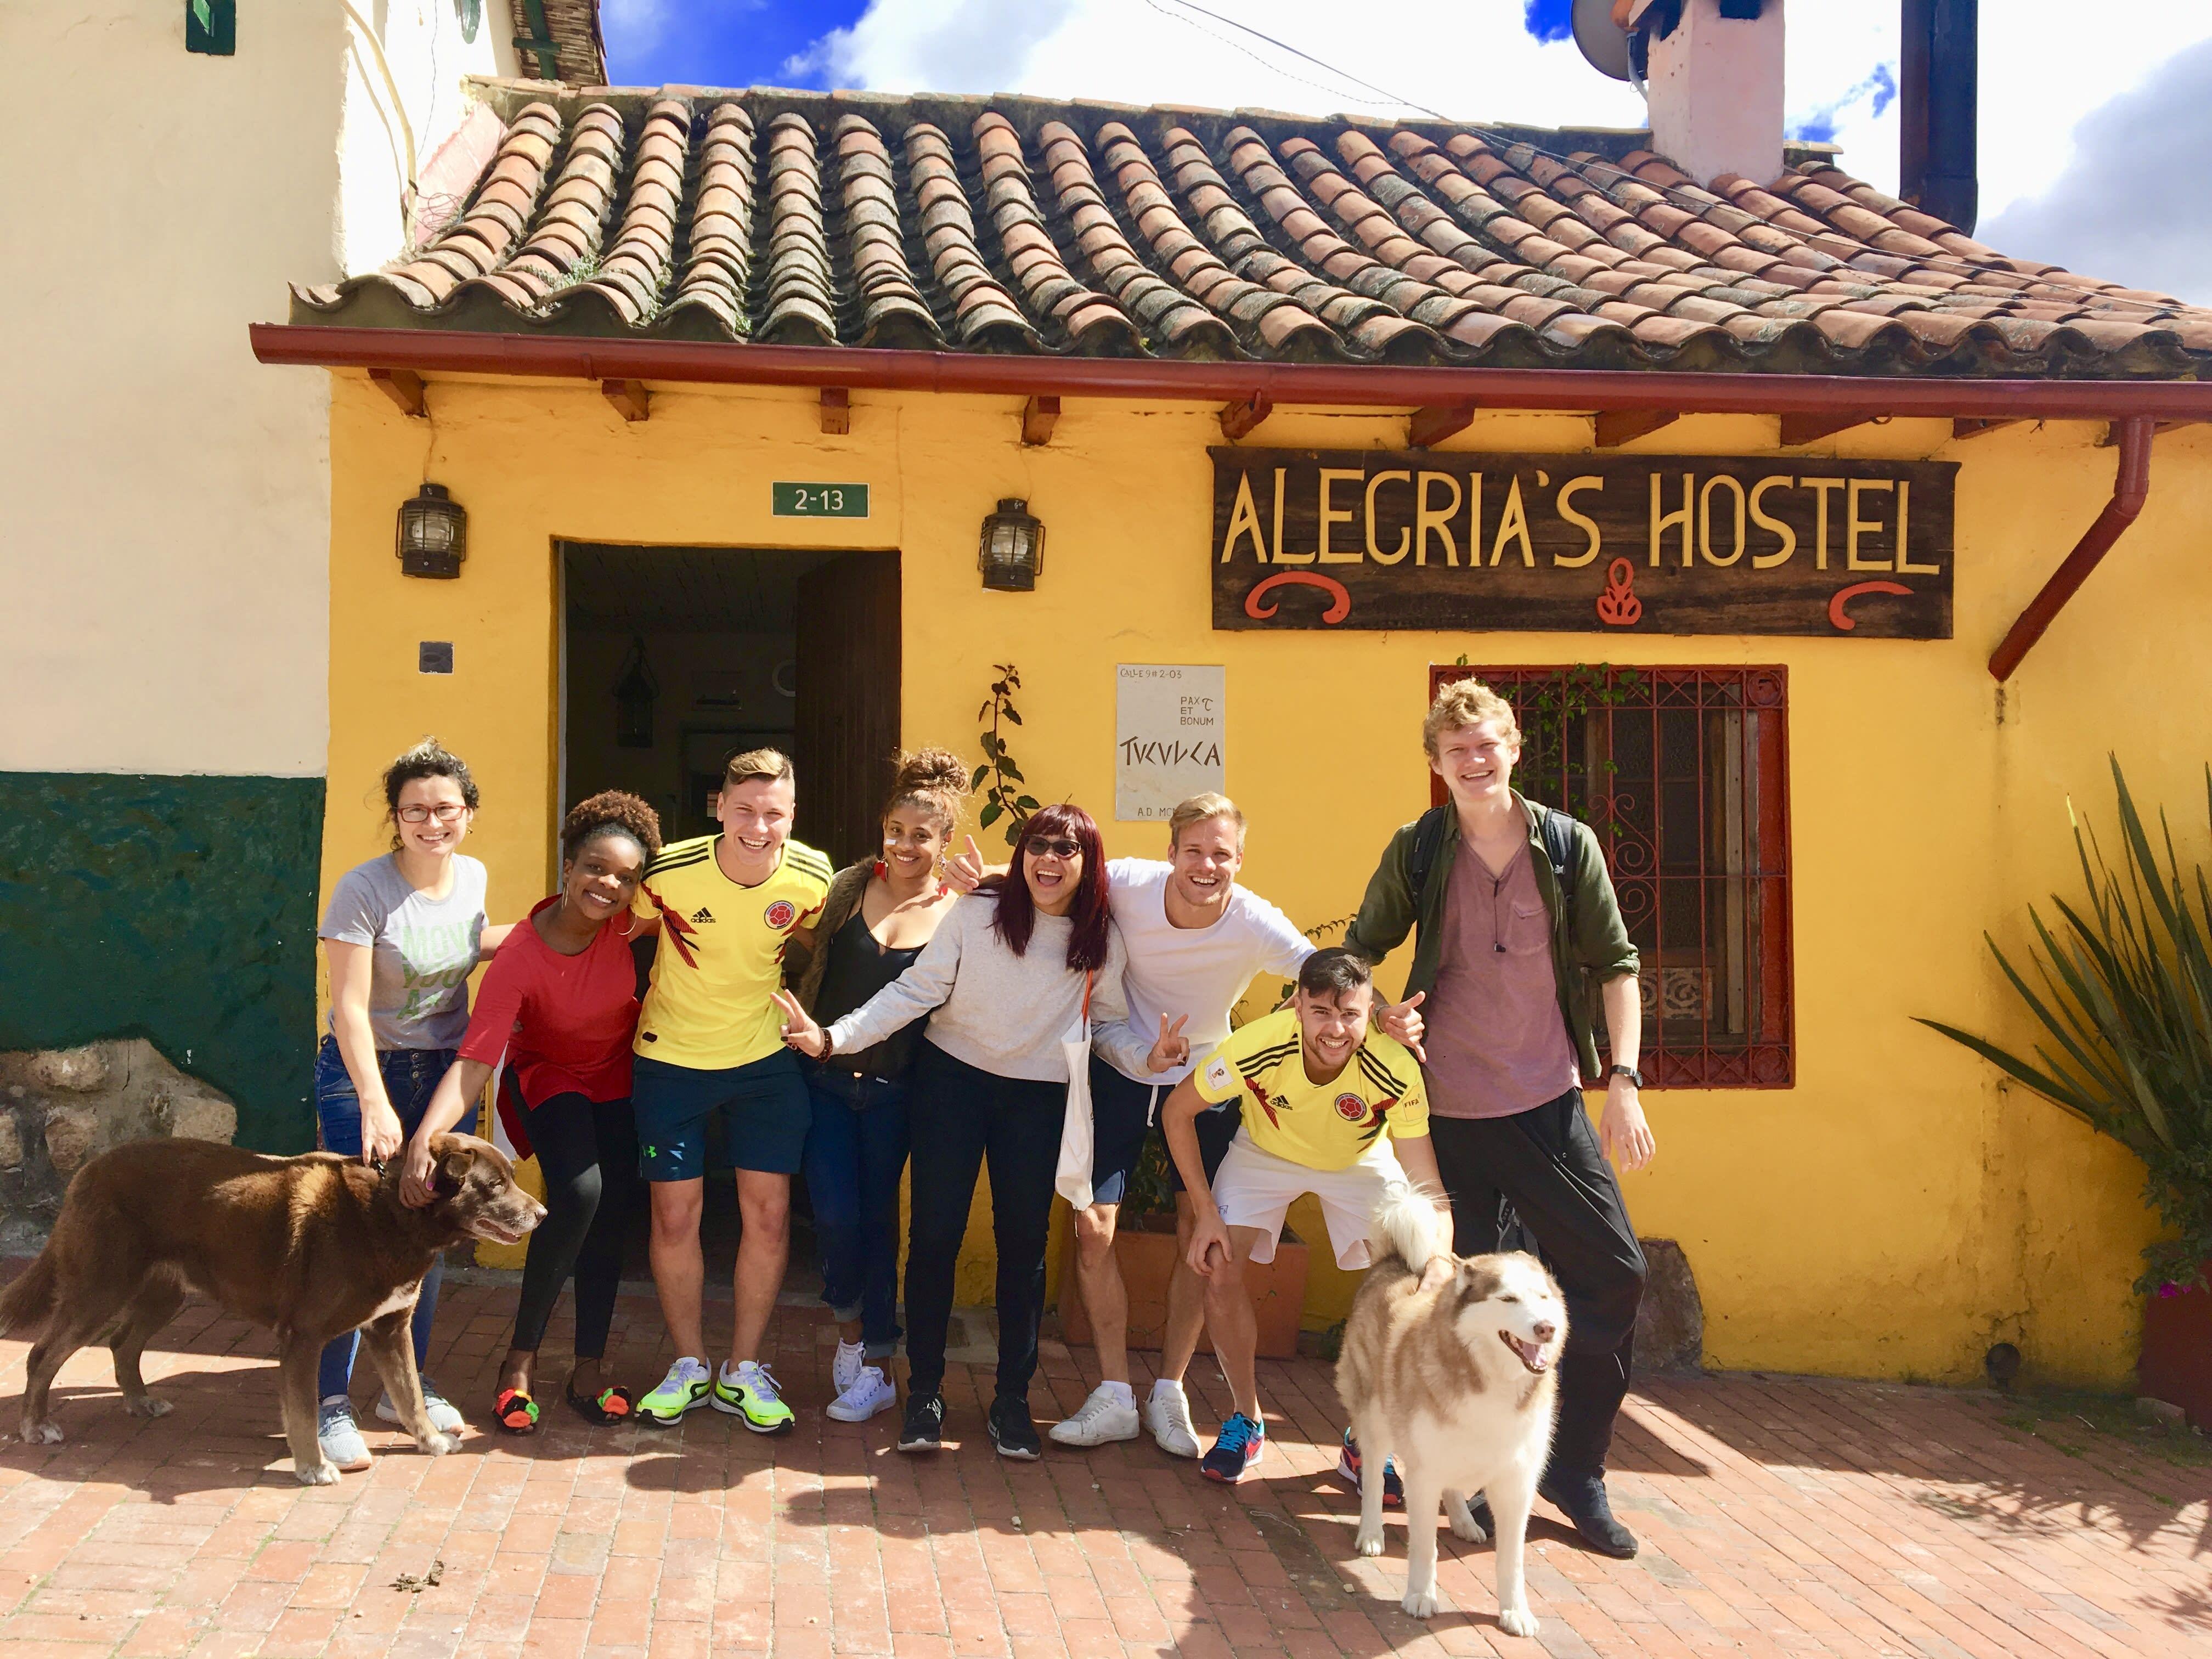 Alegria's Hostel